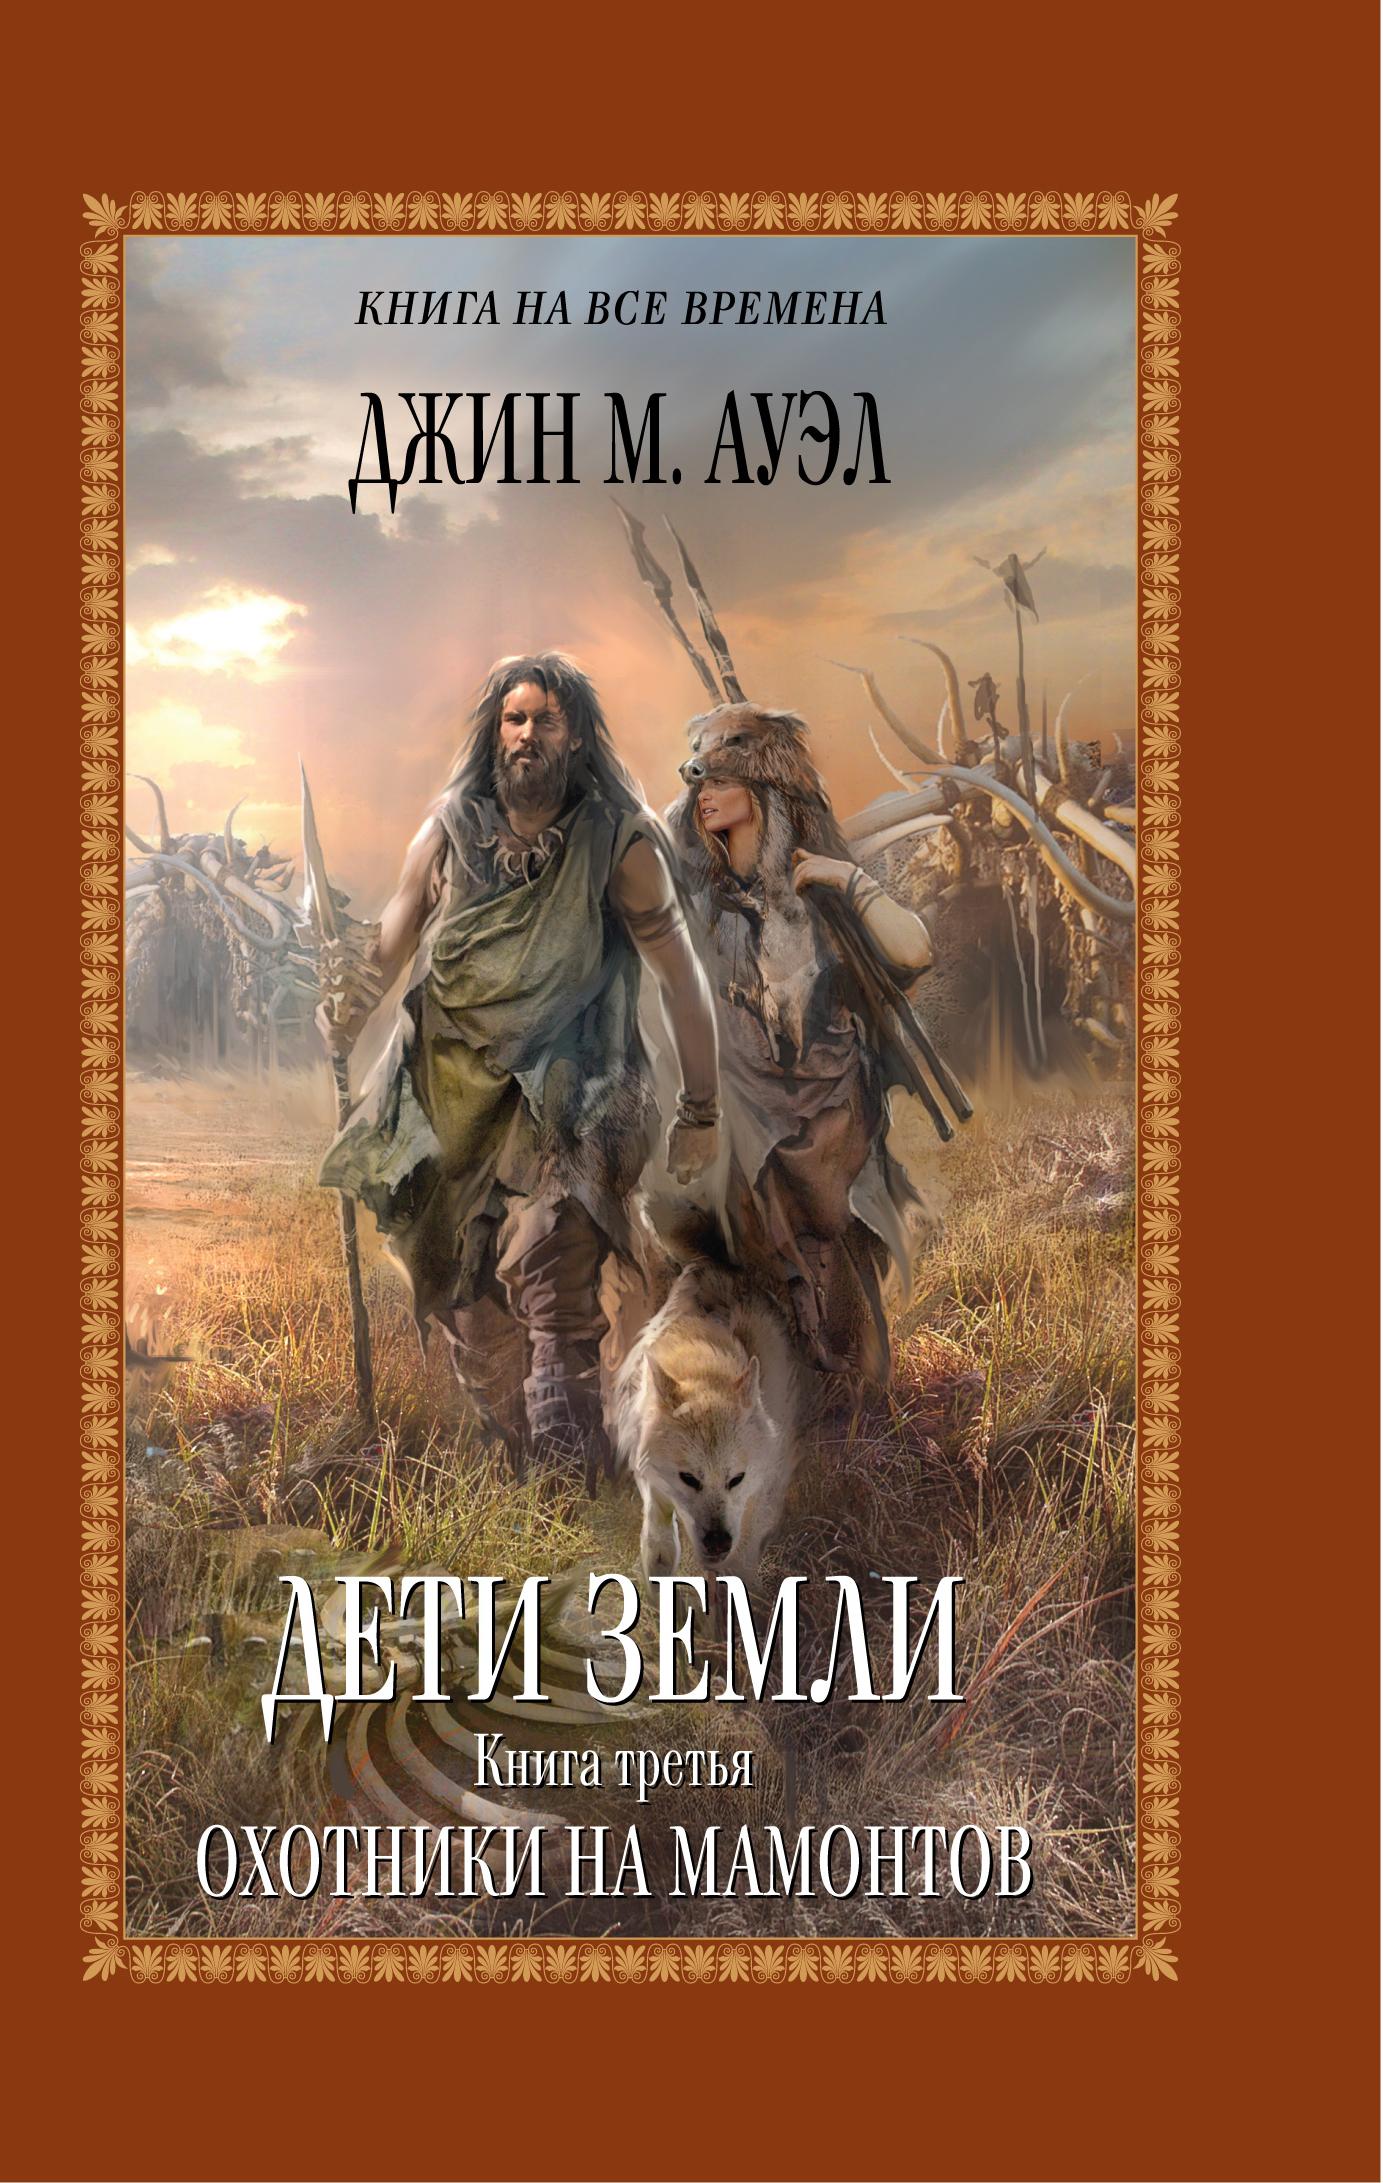 Дети Земли. Книга 3. Охотники на мамонтов